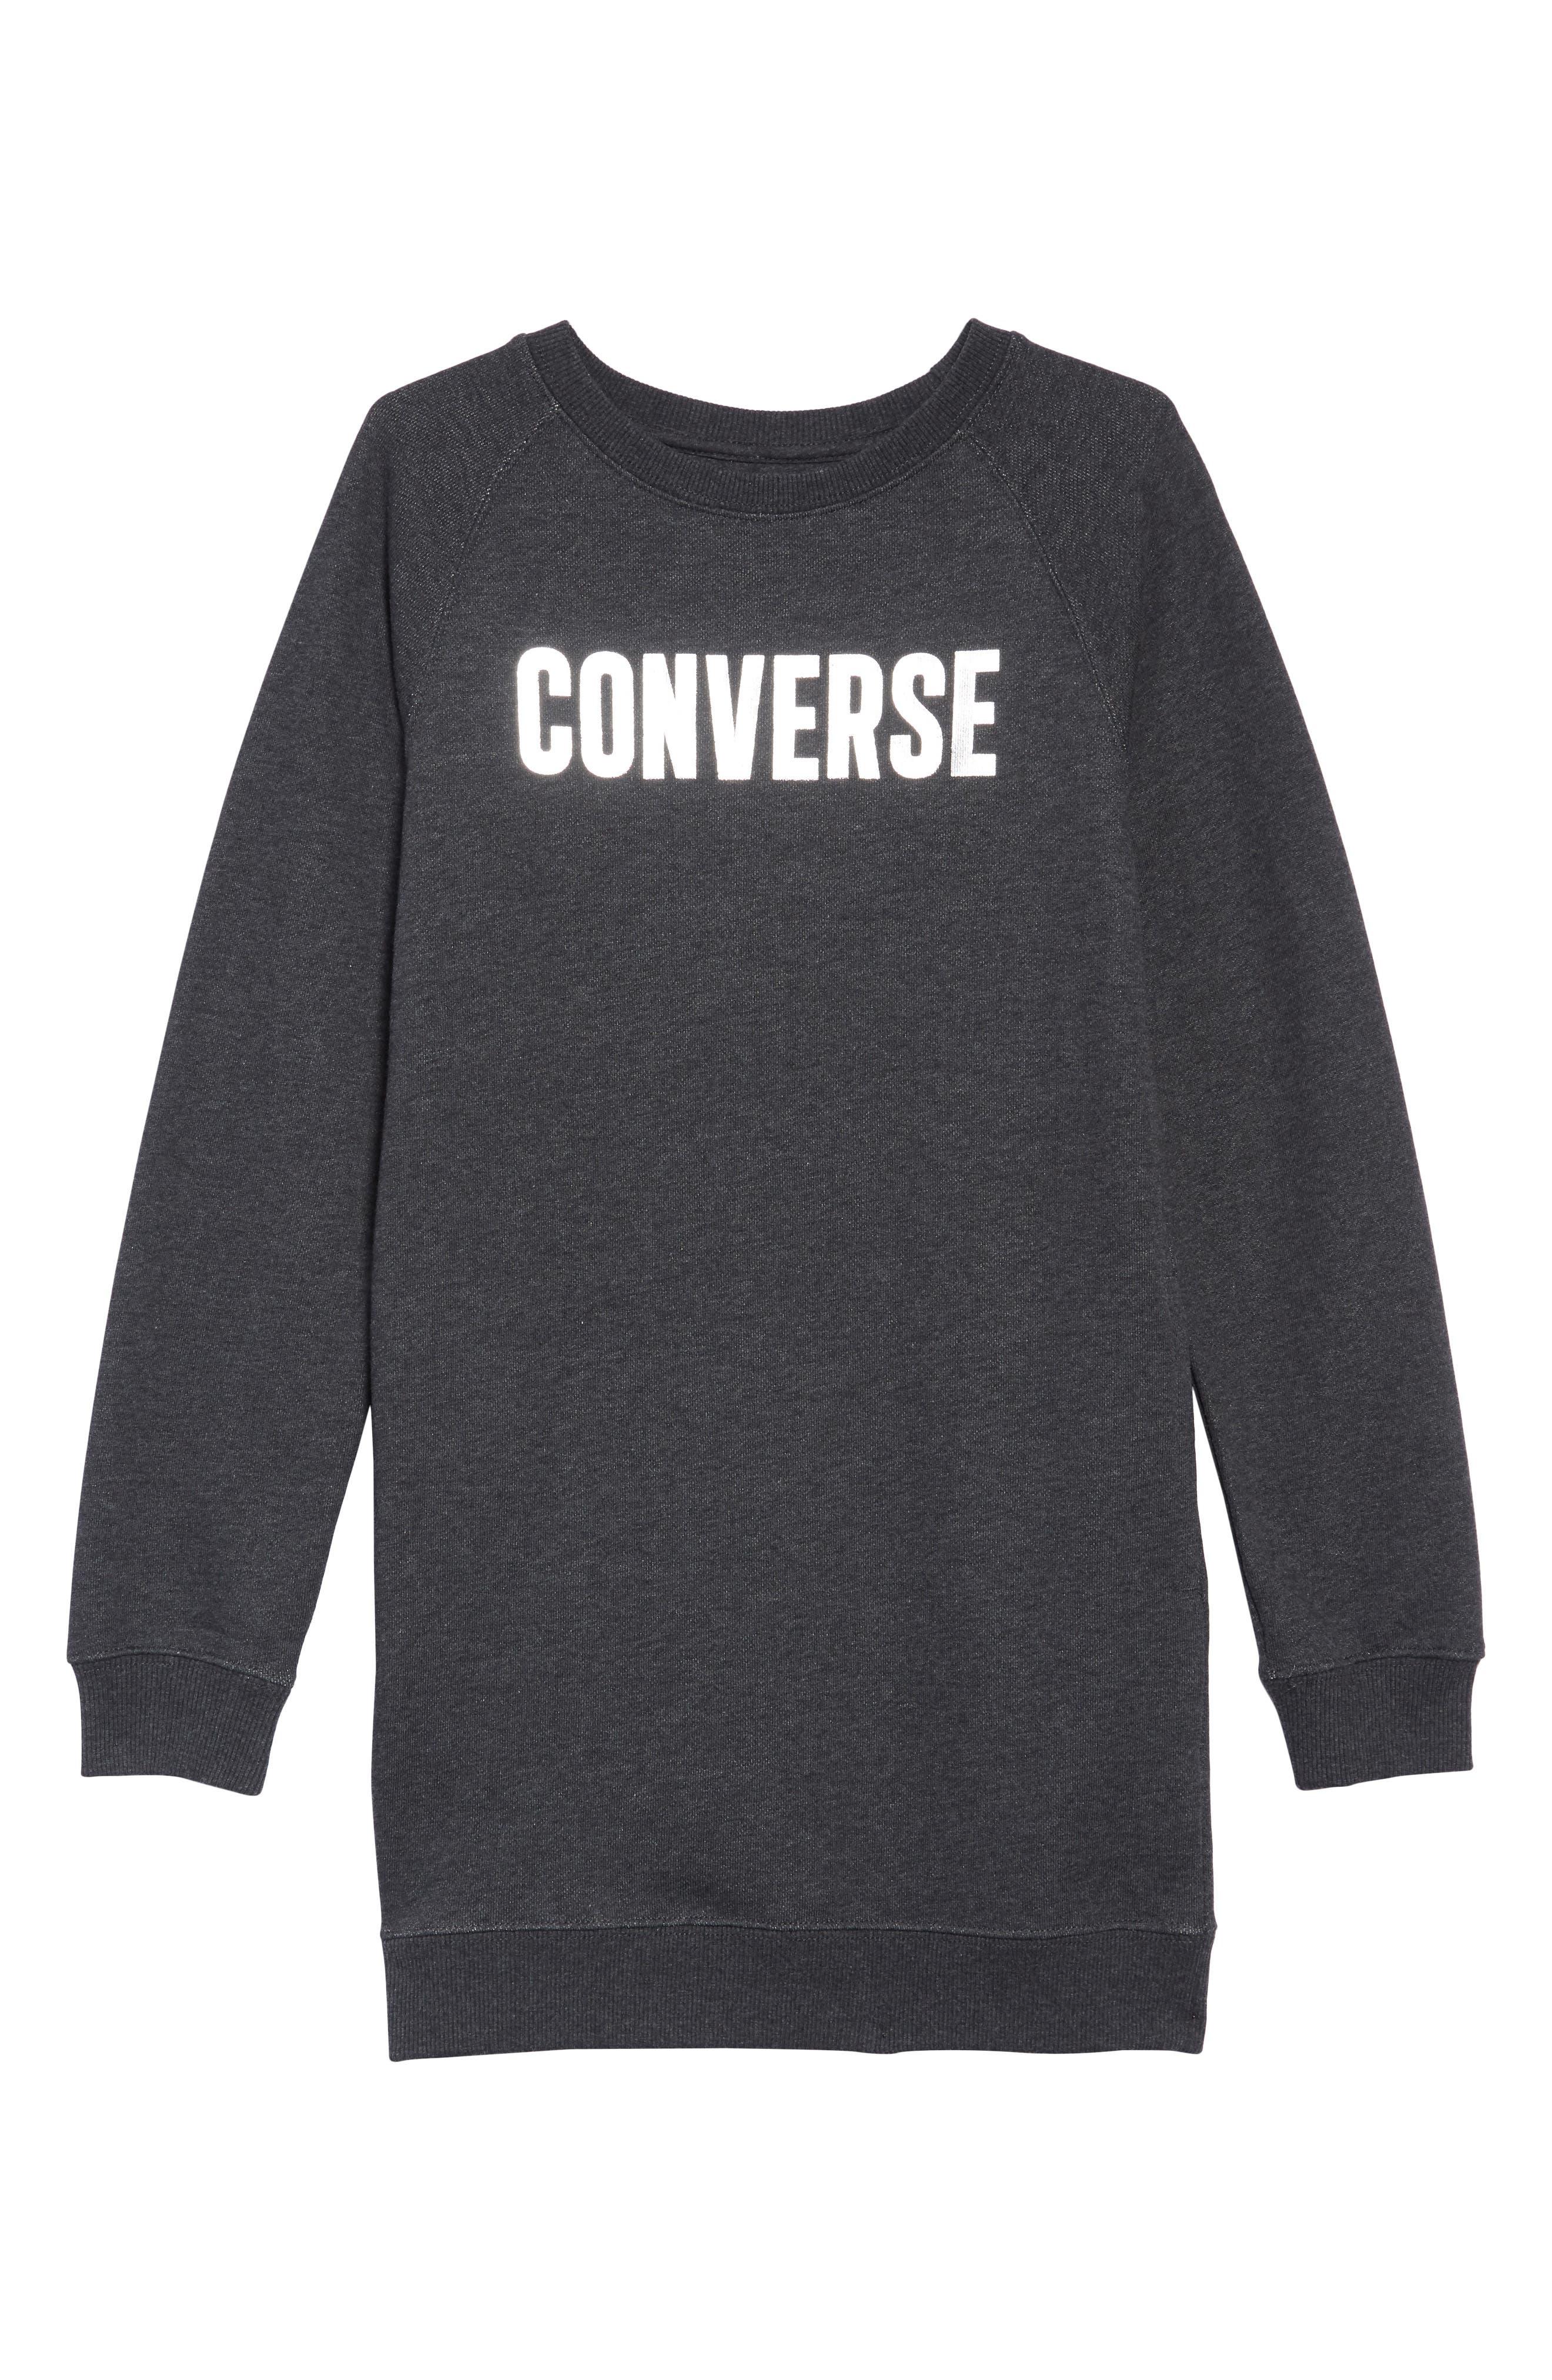 Sweatshirt Dress,                         Main,                         color, BLACK HEATHER